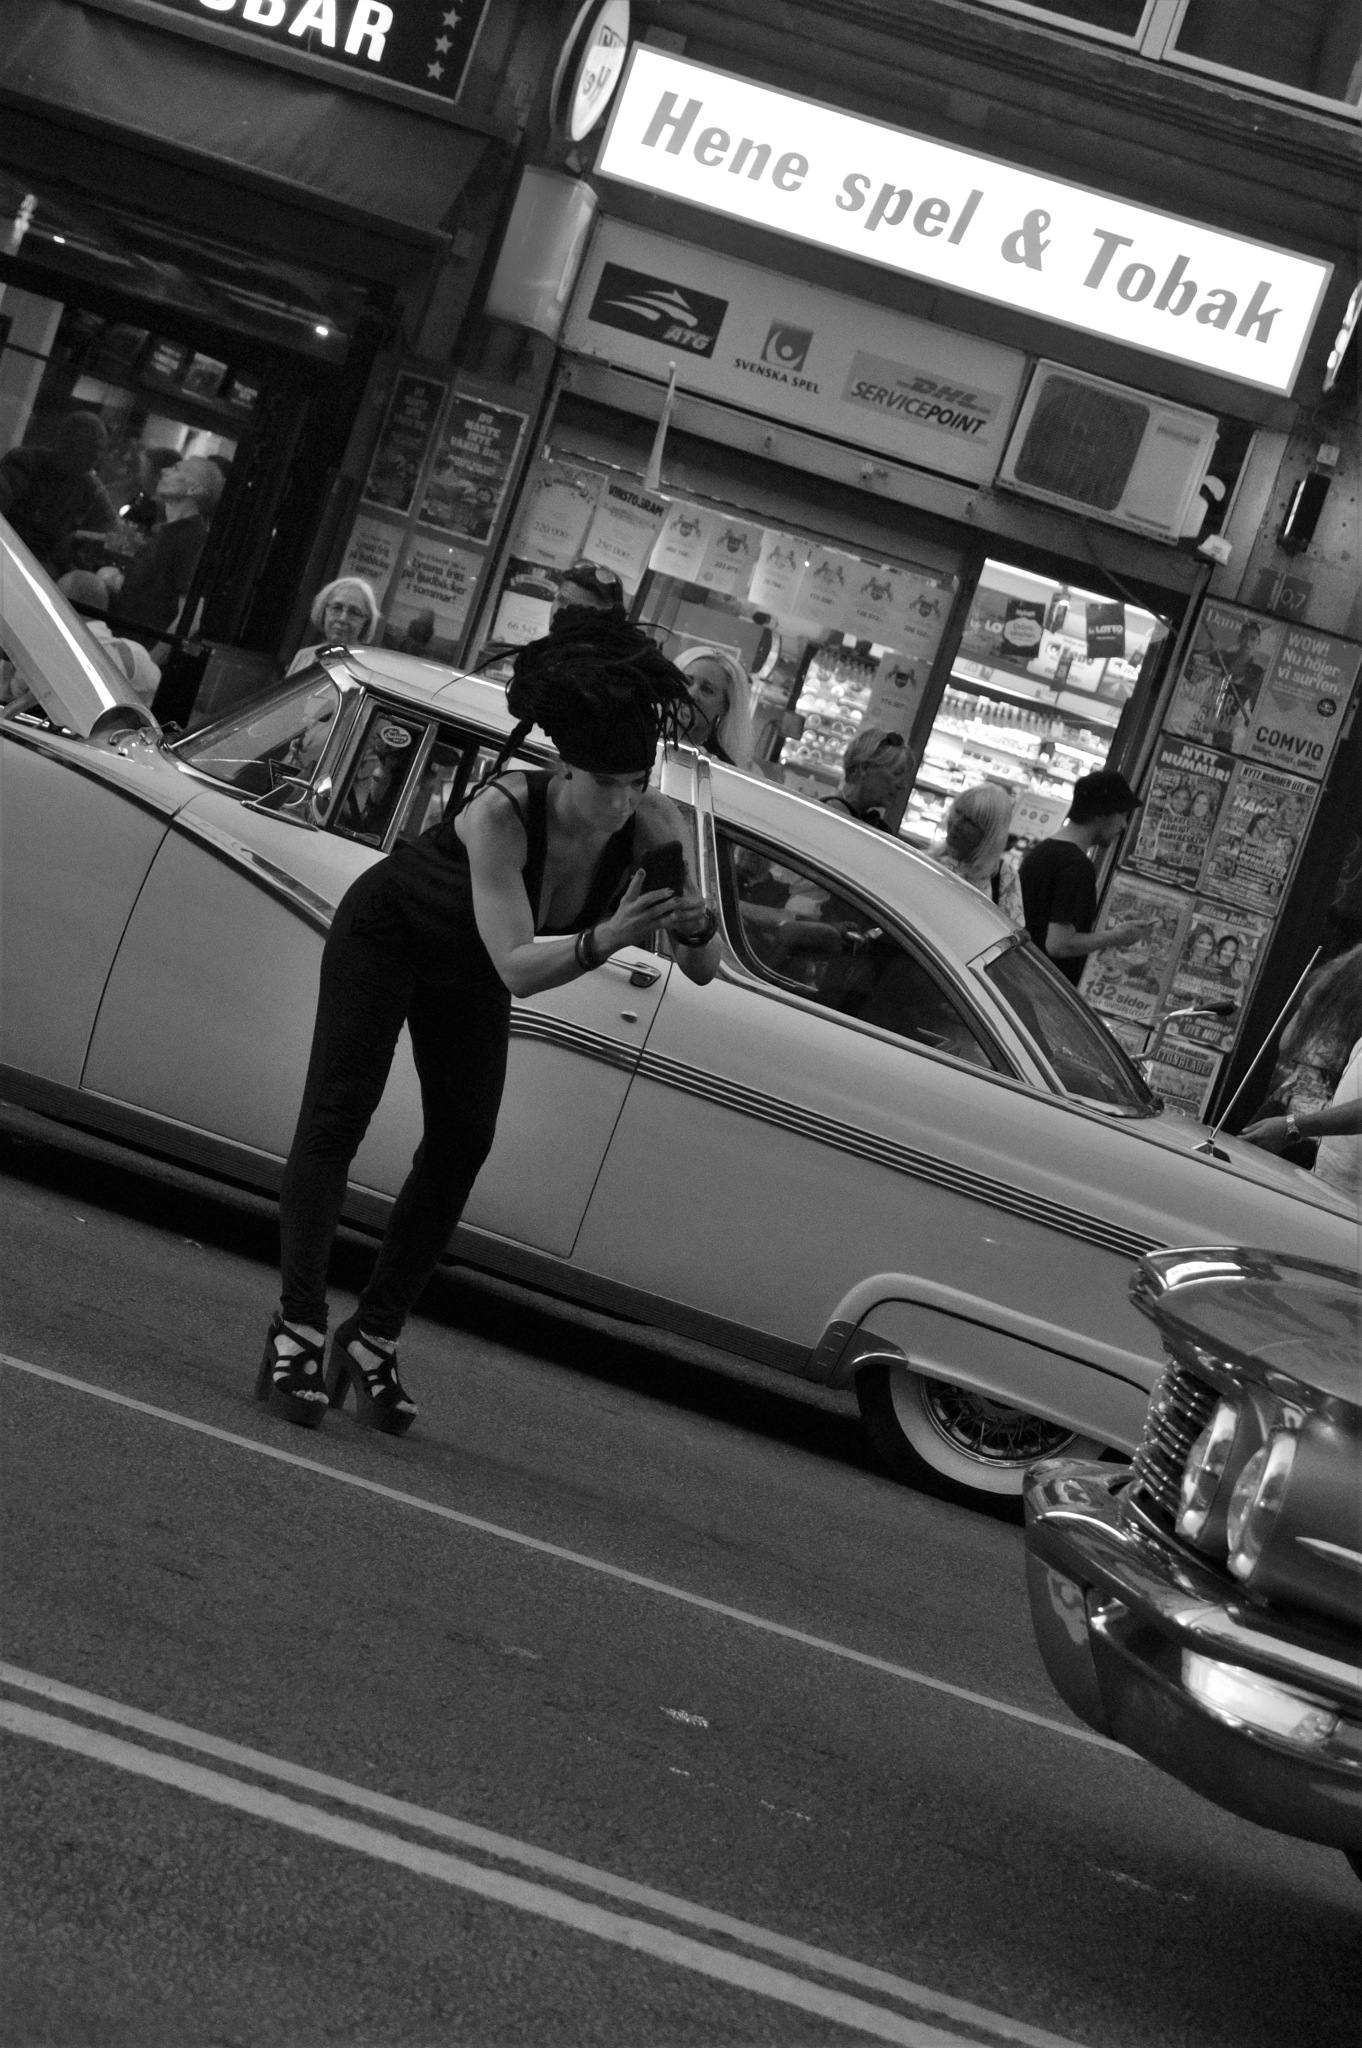 Street photo by Annica Nykvist